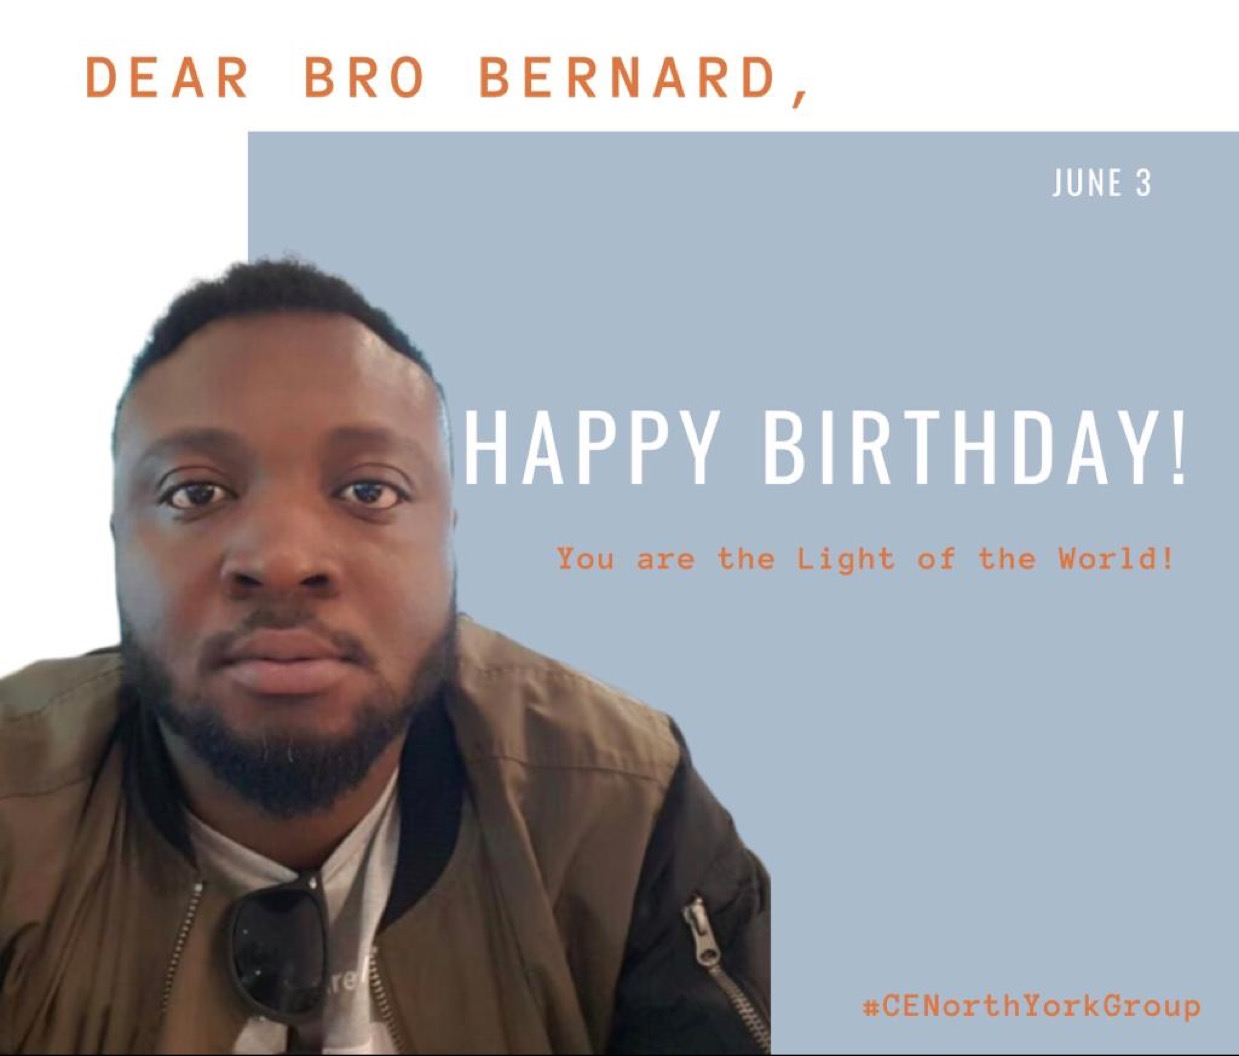 Happy birthday Bro Bernard! This